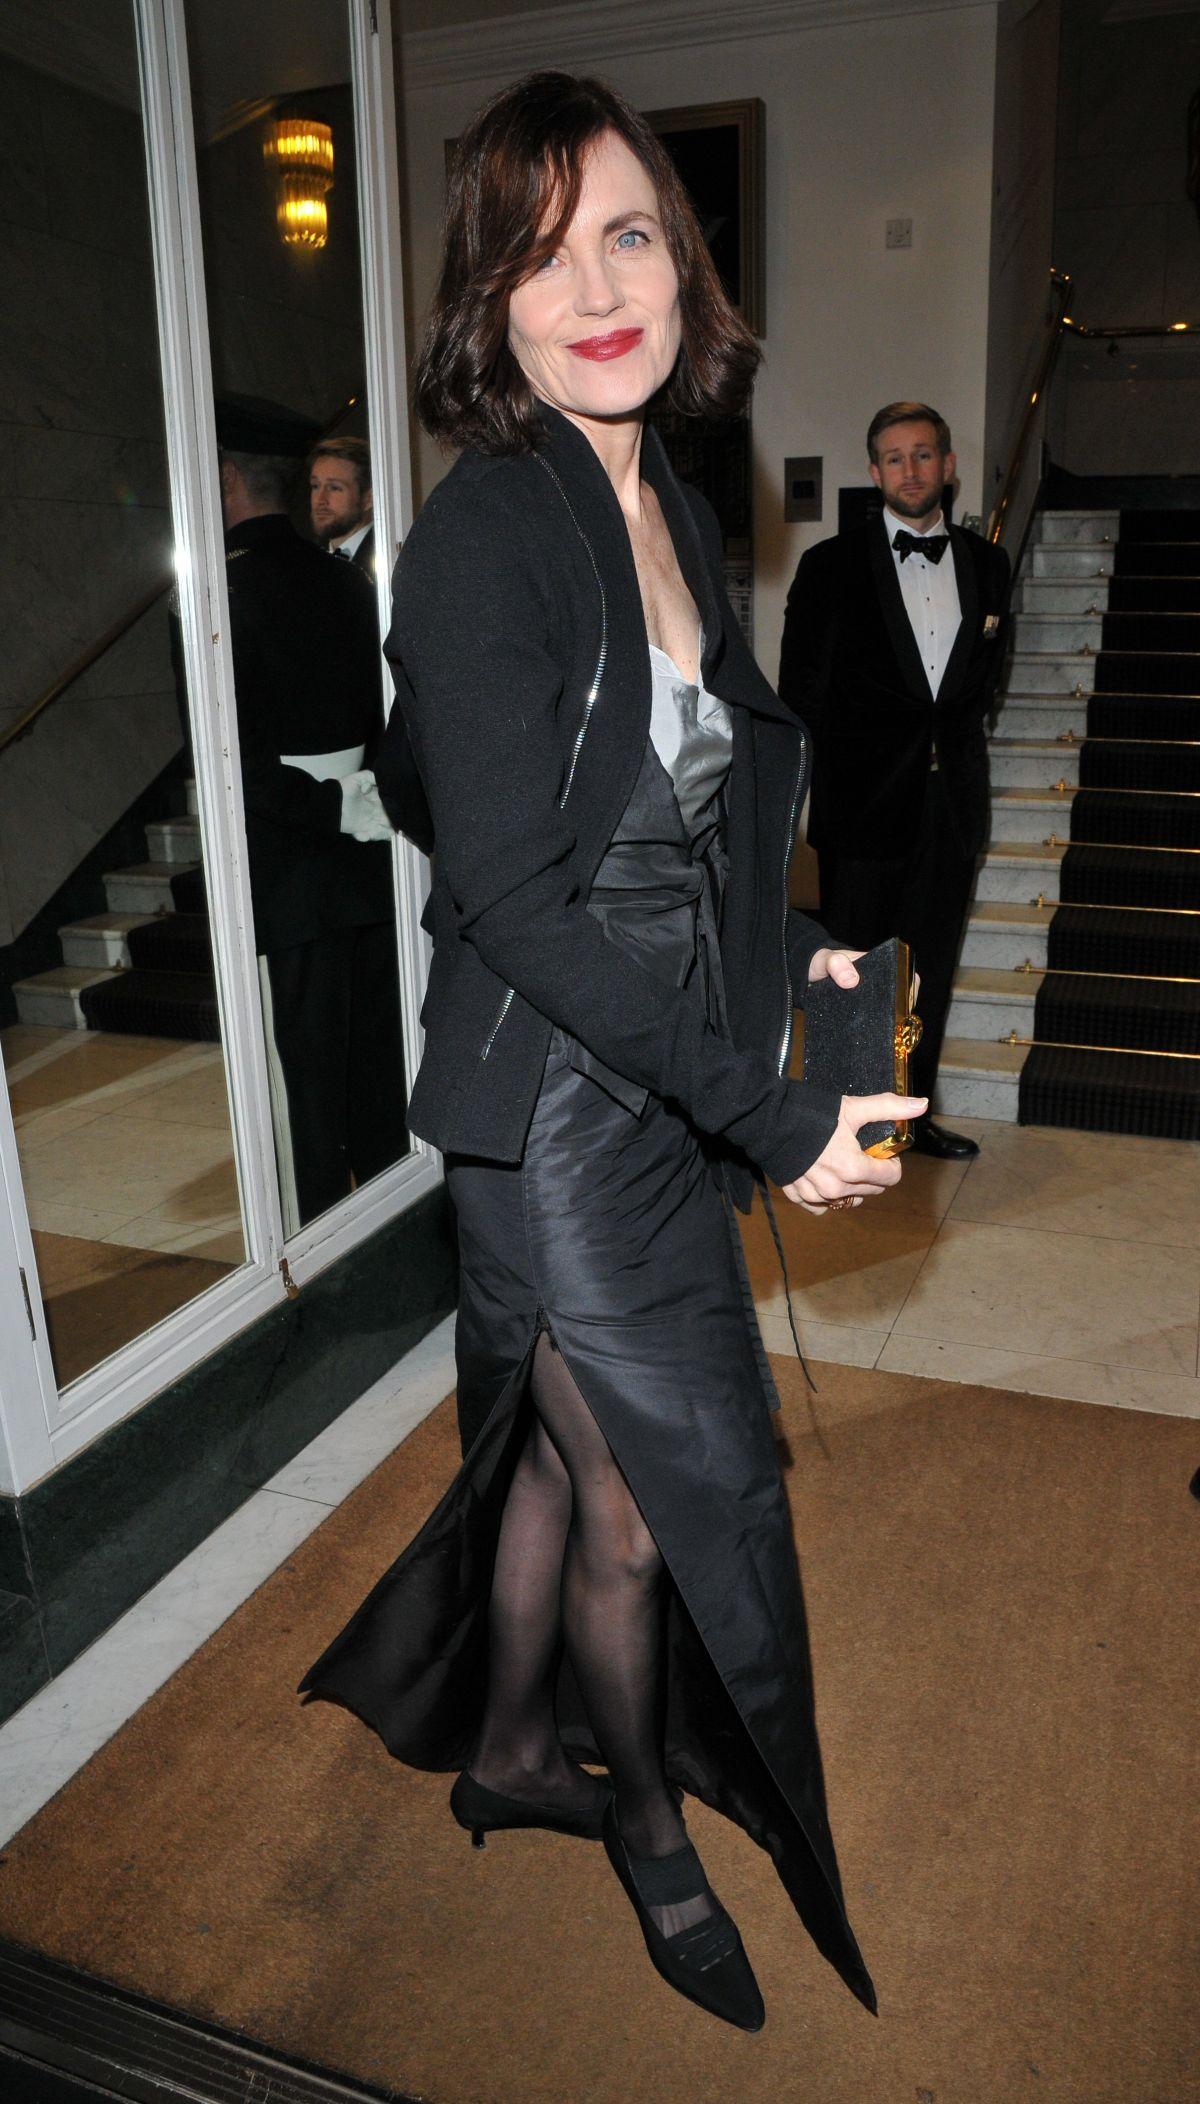 Elizabeth mcgovern arrives at harvey weinstein pre baftas dinner in london new pictures